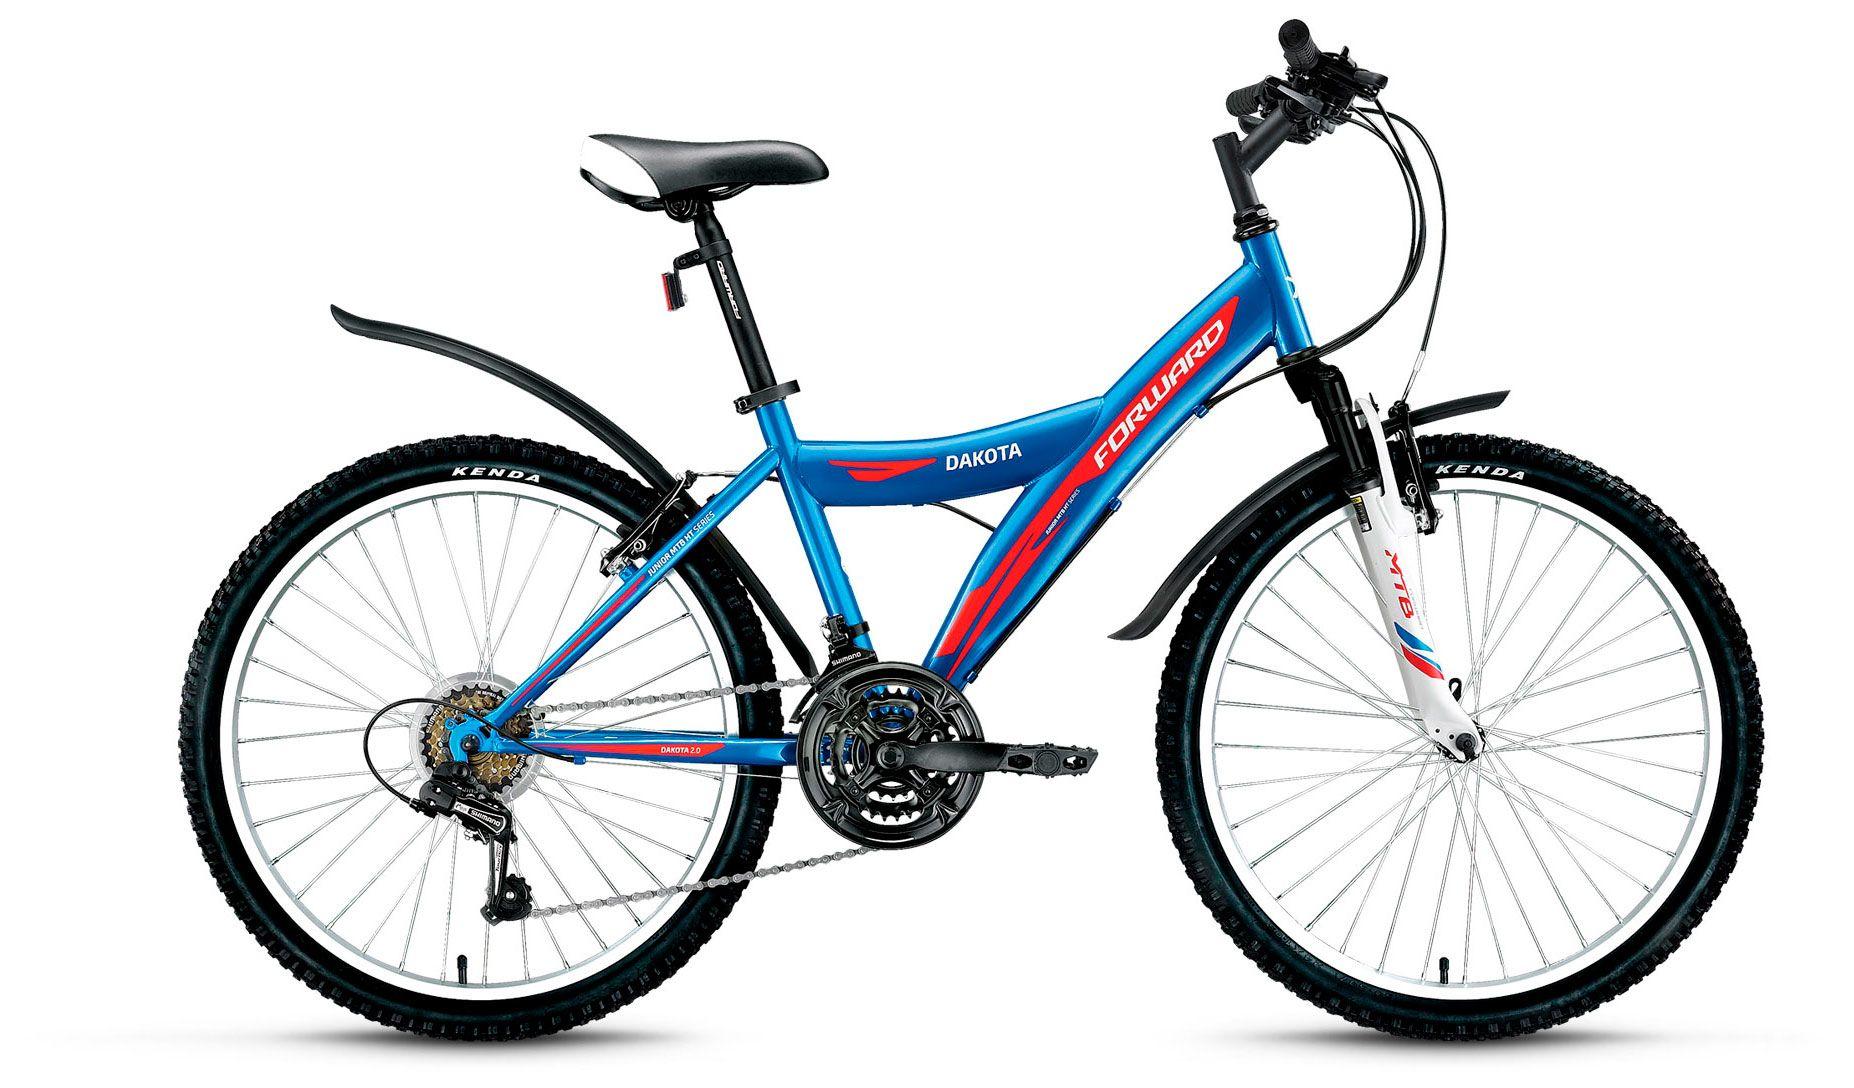 Велосипед Forward Dakota 24 2.0 2018 велосипед forward azure 24 24 2016